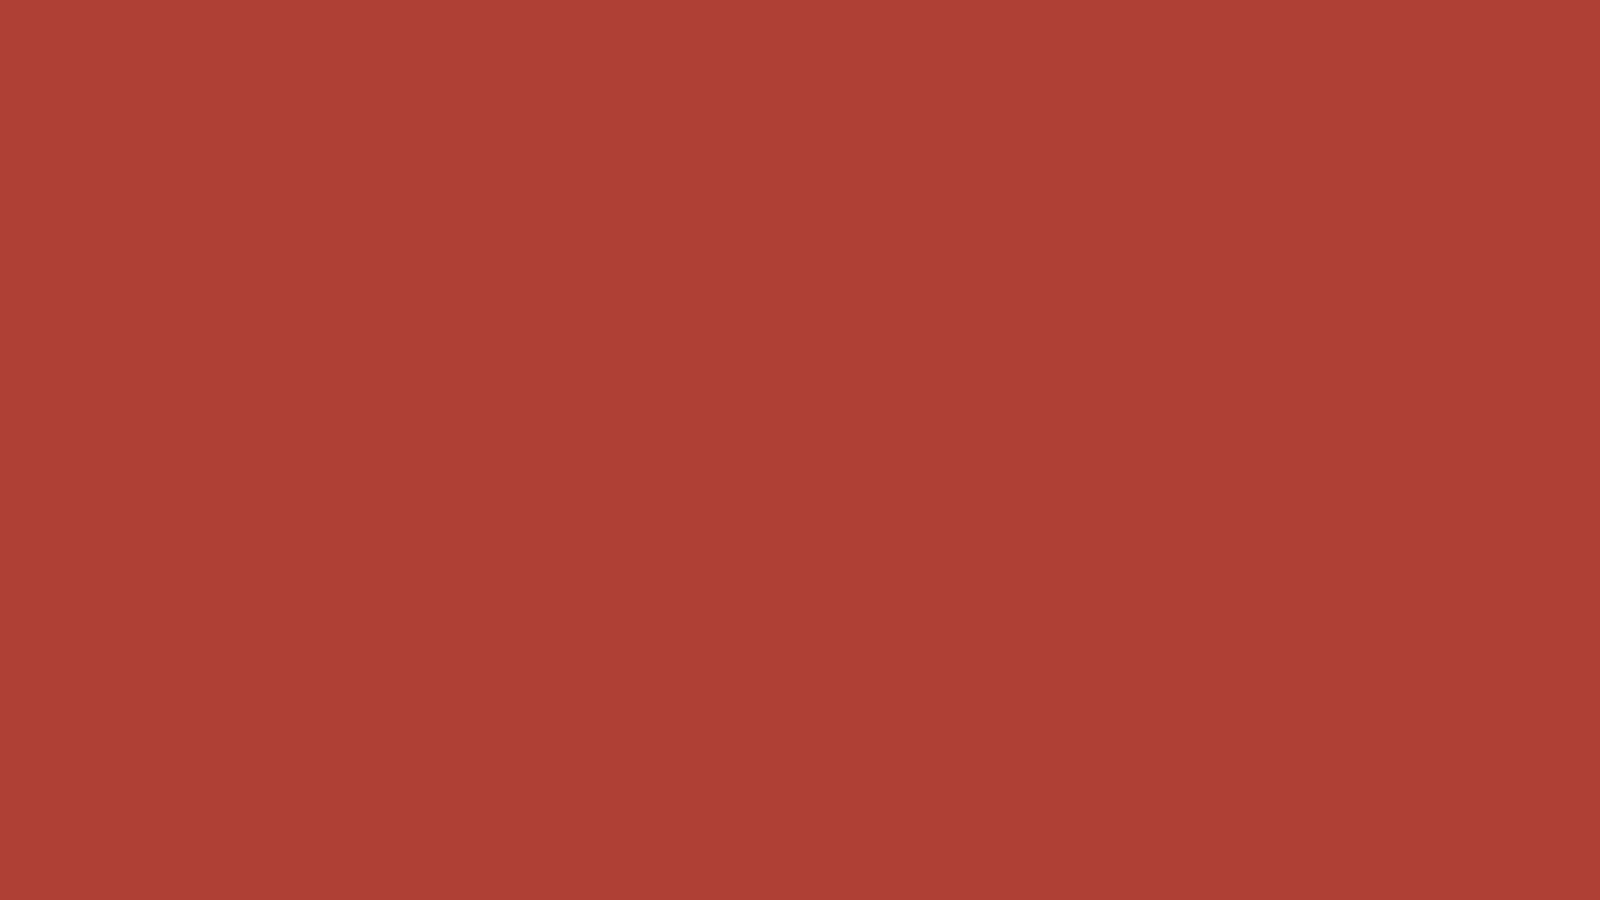 1600x900 Medium Carmine Solid Color Background